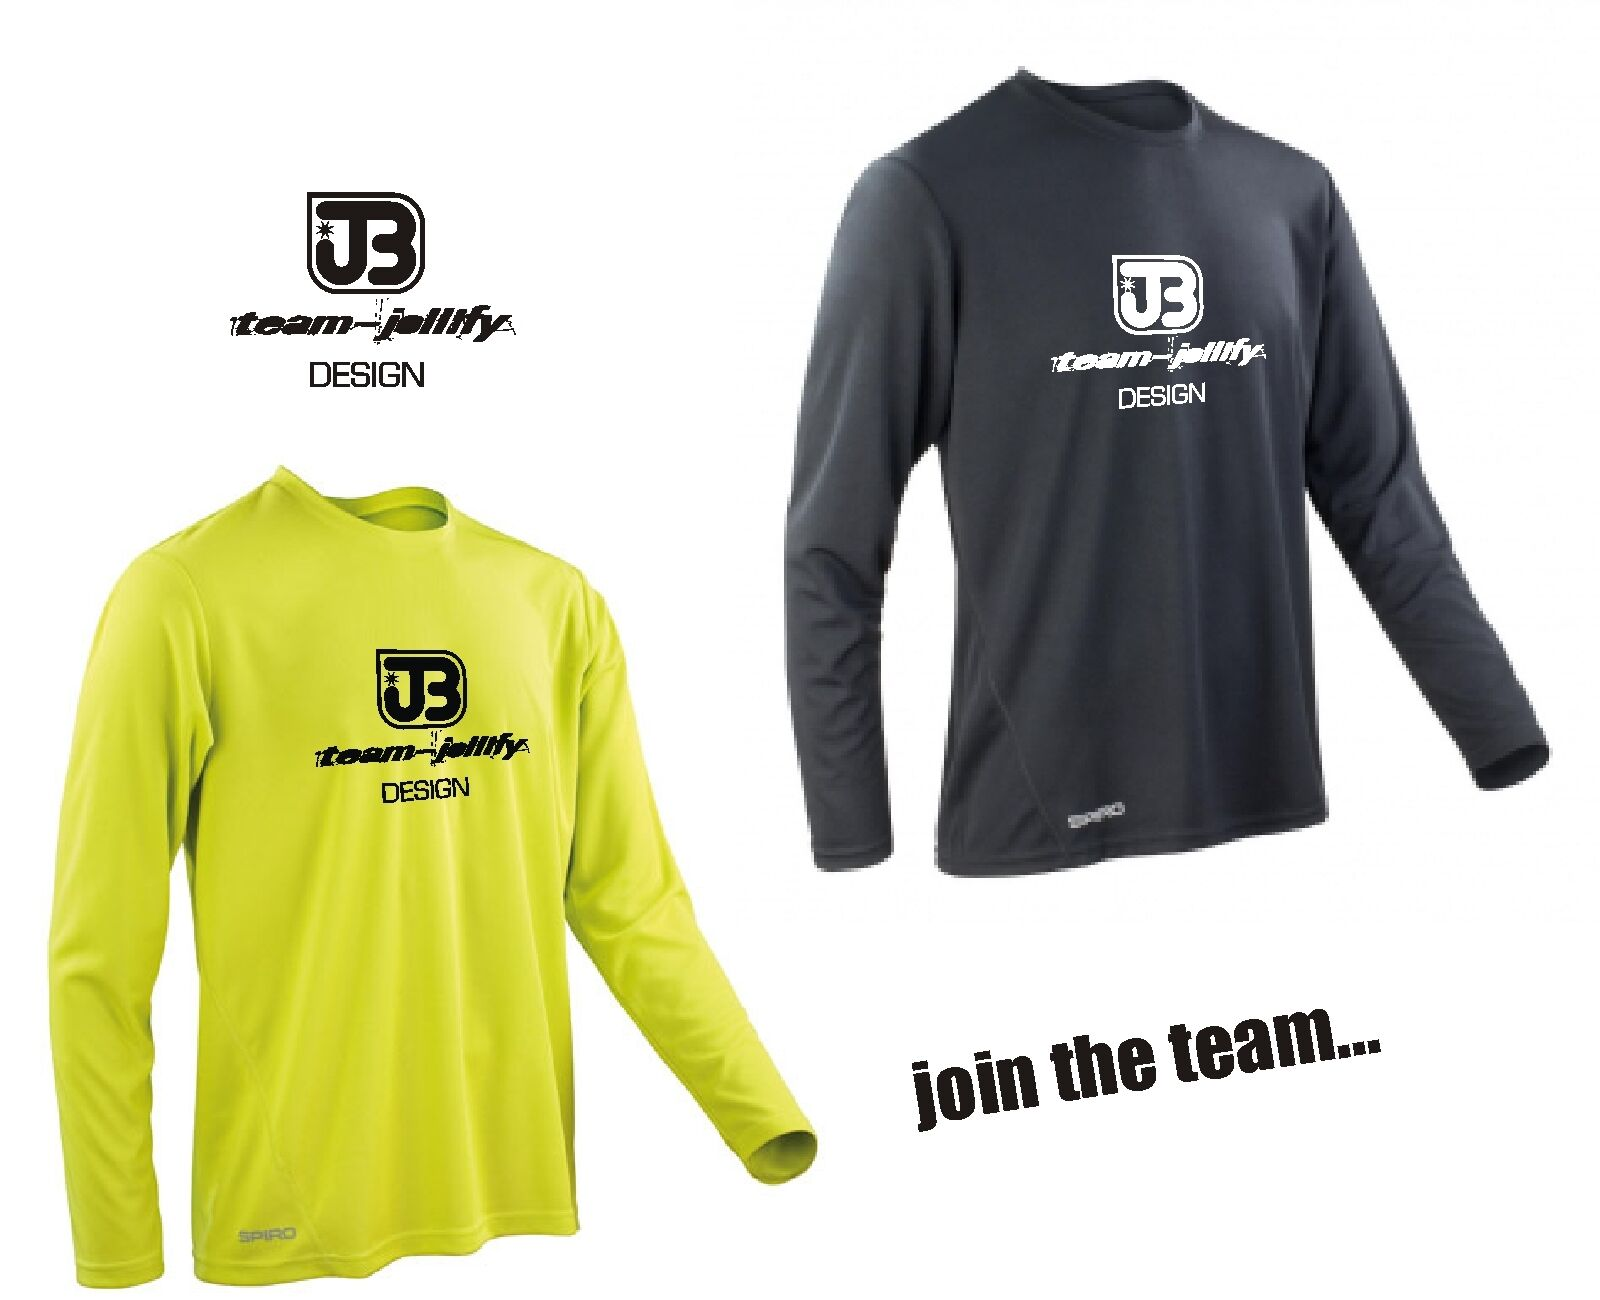 Team - jollify  diseño camiseta jersey Downhill Freeride MTB Bicicleta DH Enduro  authentic quality